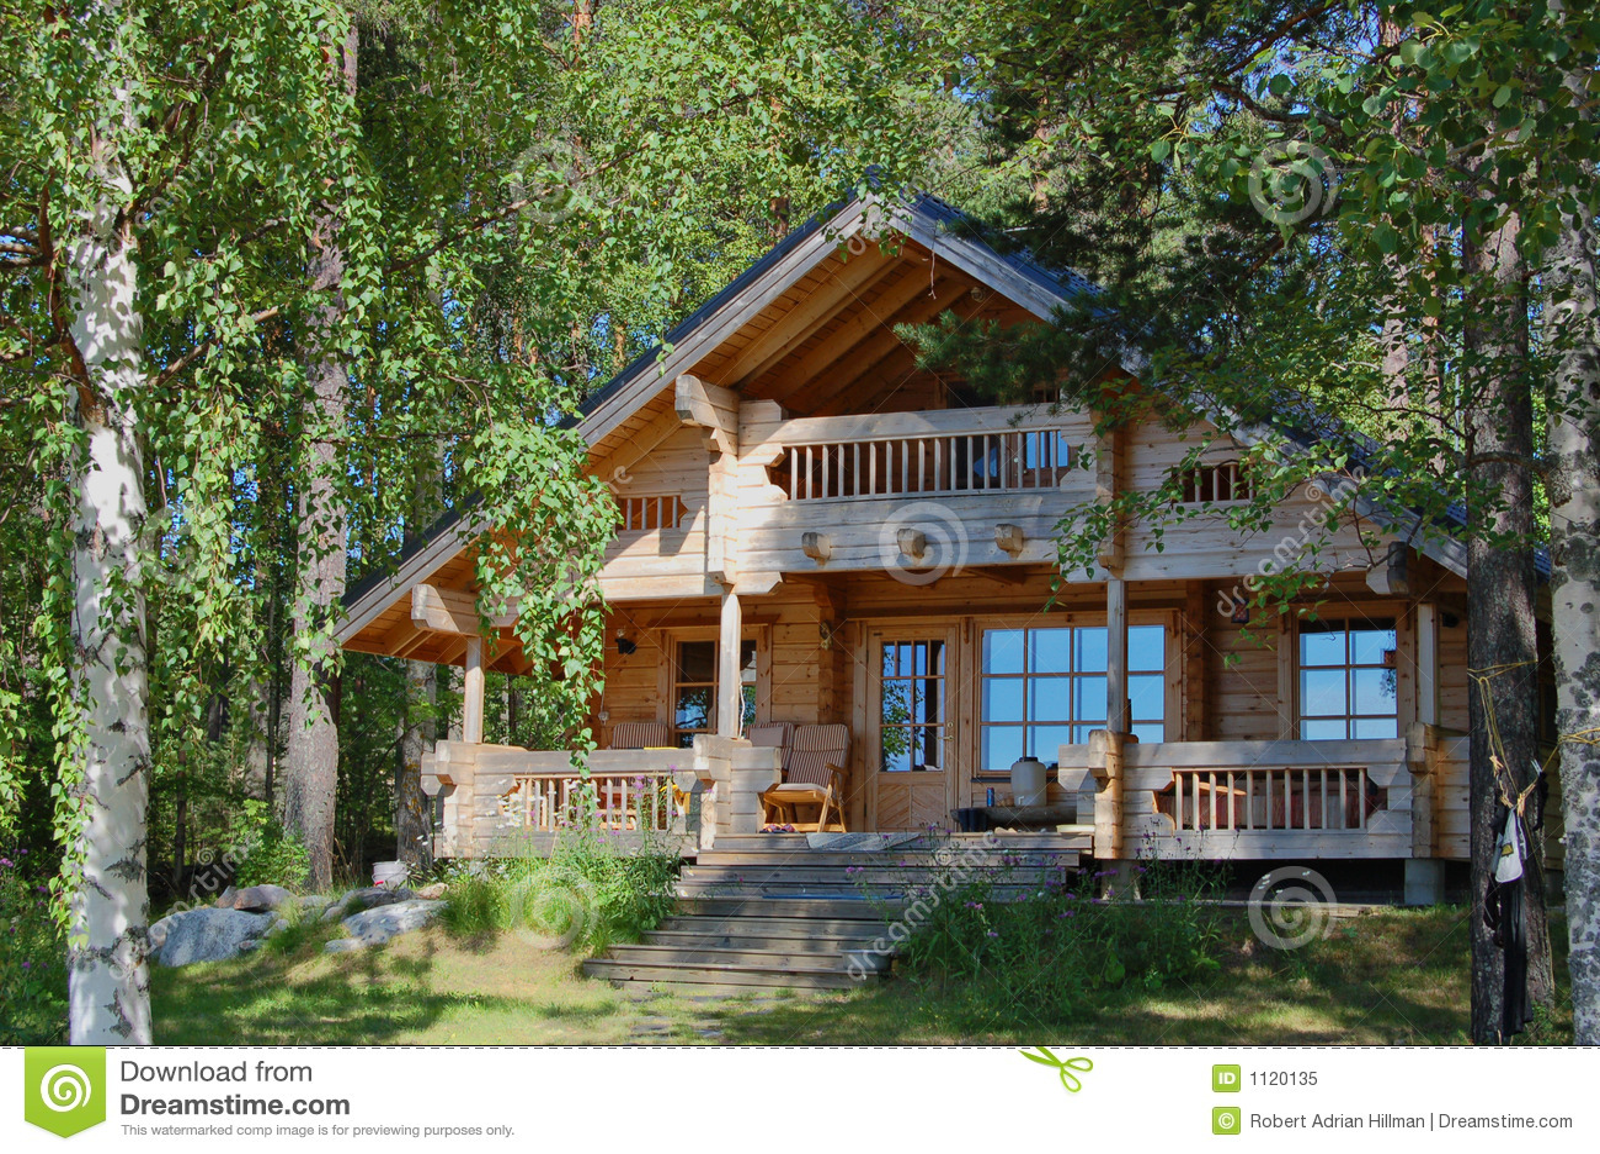 Summer Cottage Royalty Free Stock Photo Image 1120135